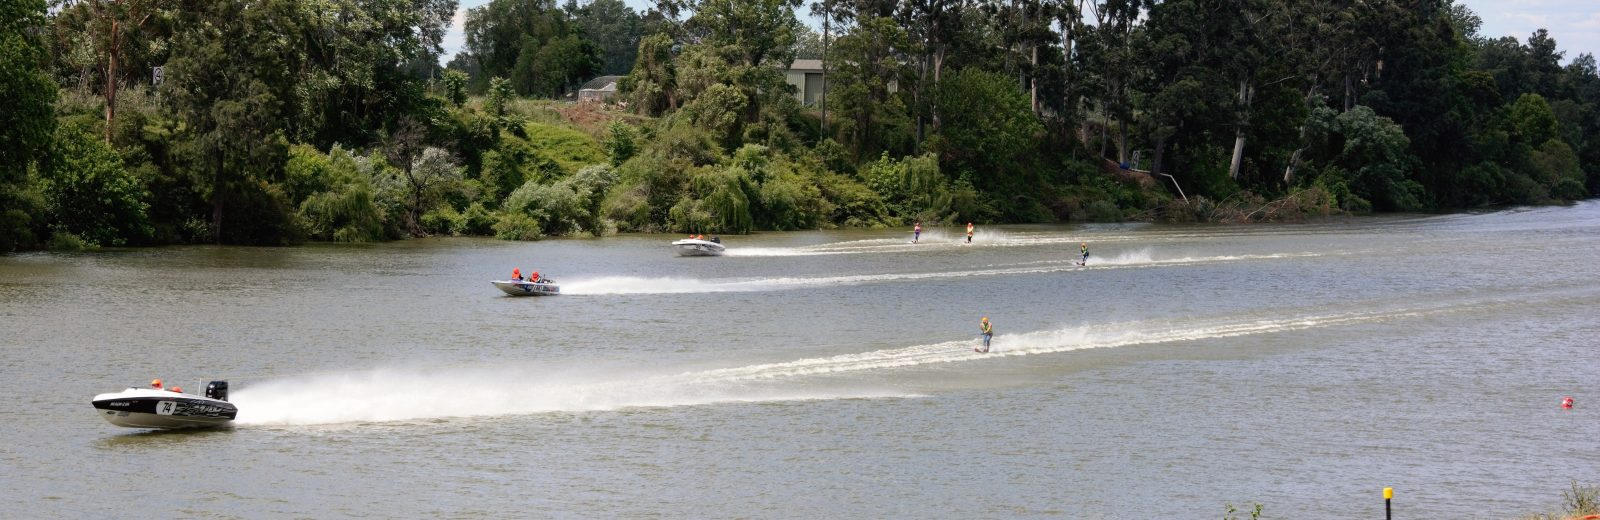 Ski Racing Australia